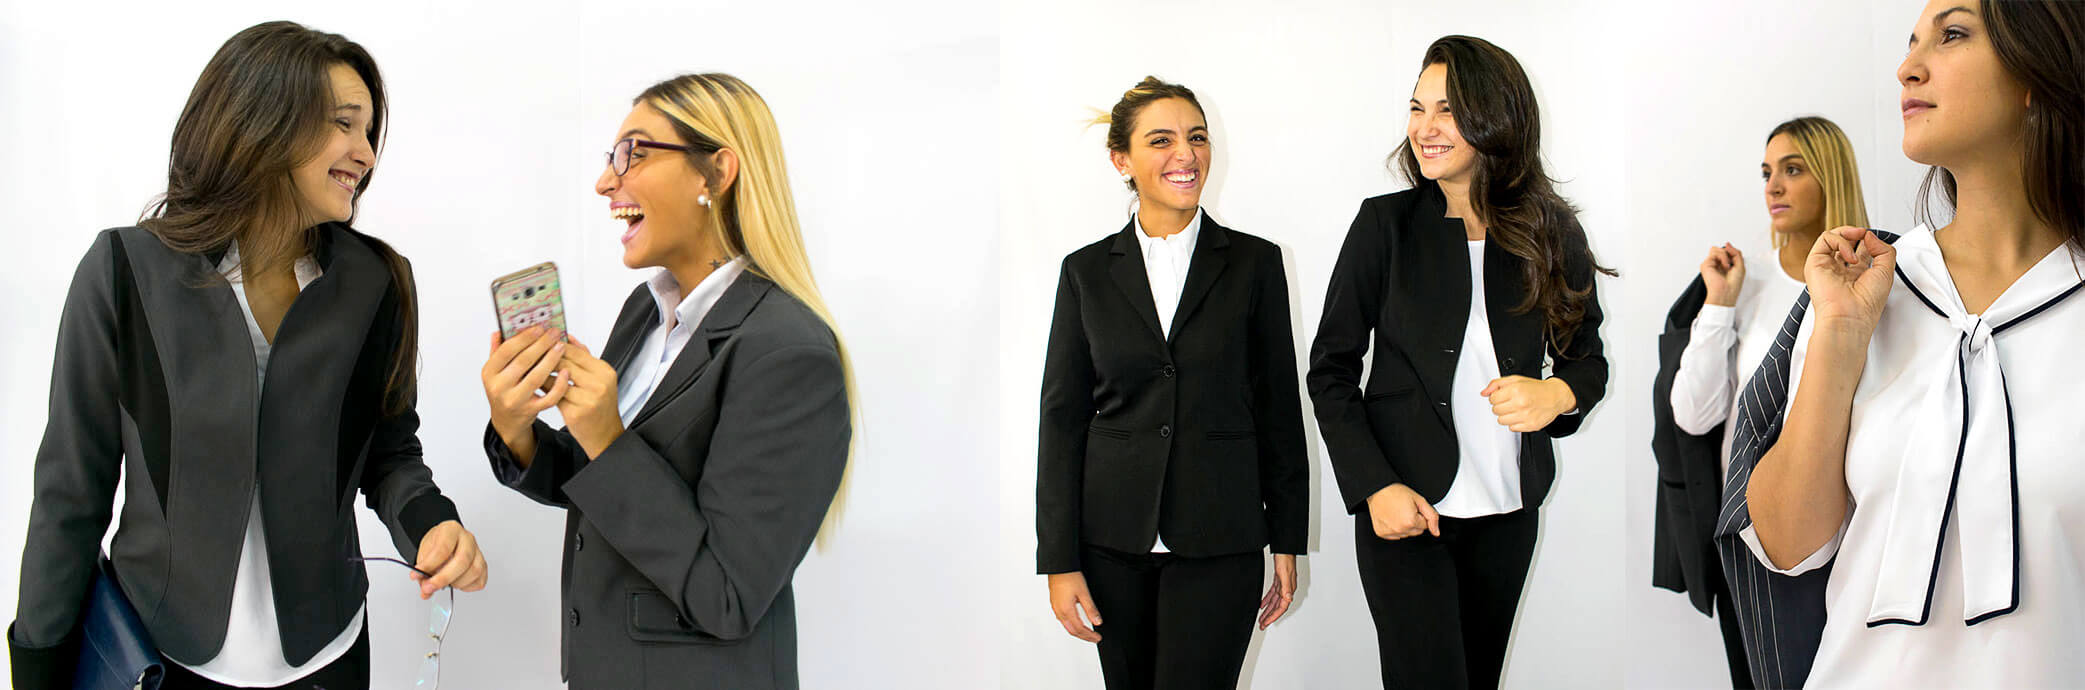 Uniformes ejecutivos de dama